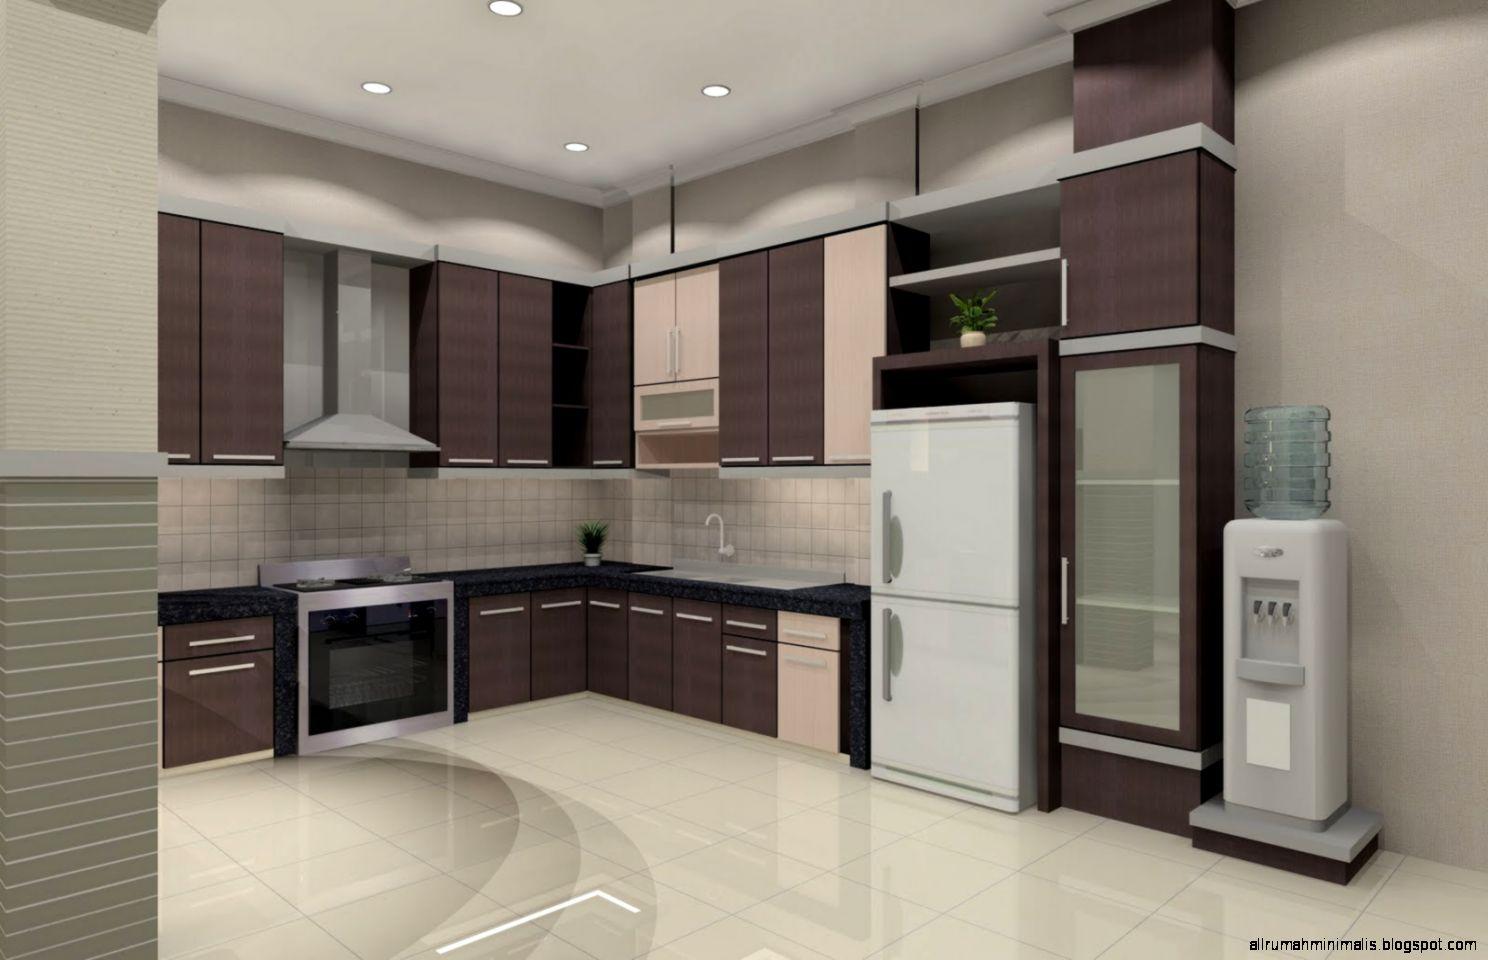 Gambar Model Interior Rumah Minimalis Modern  rumah idaman